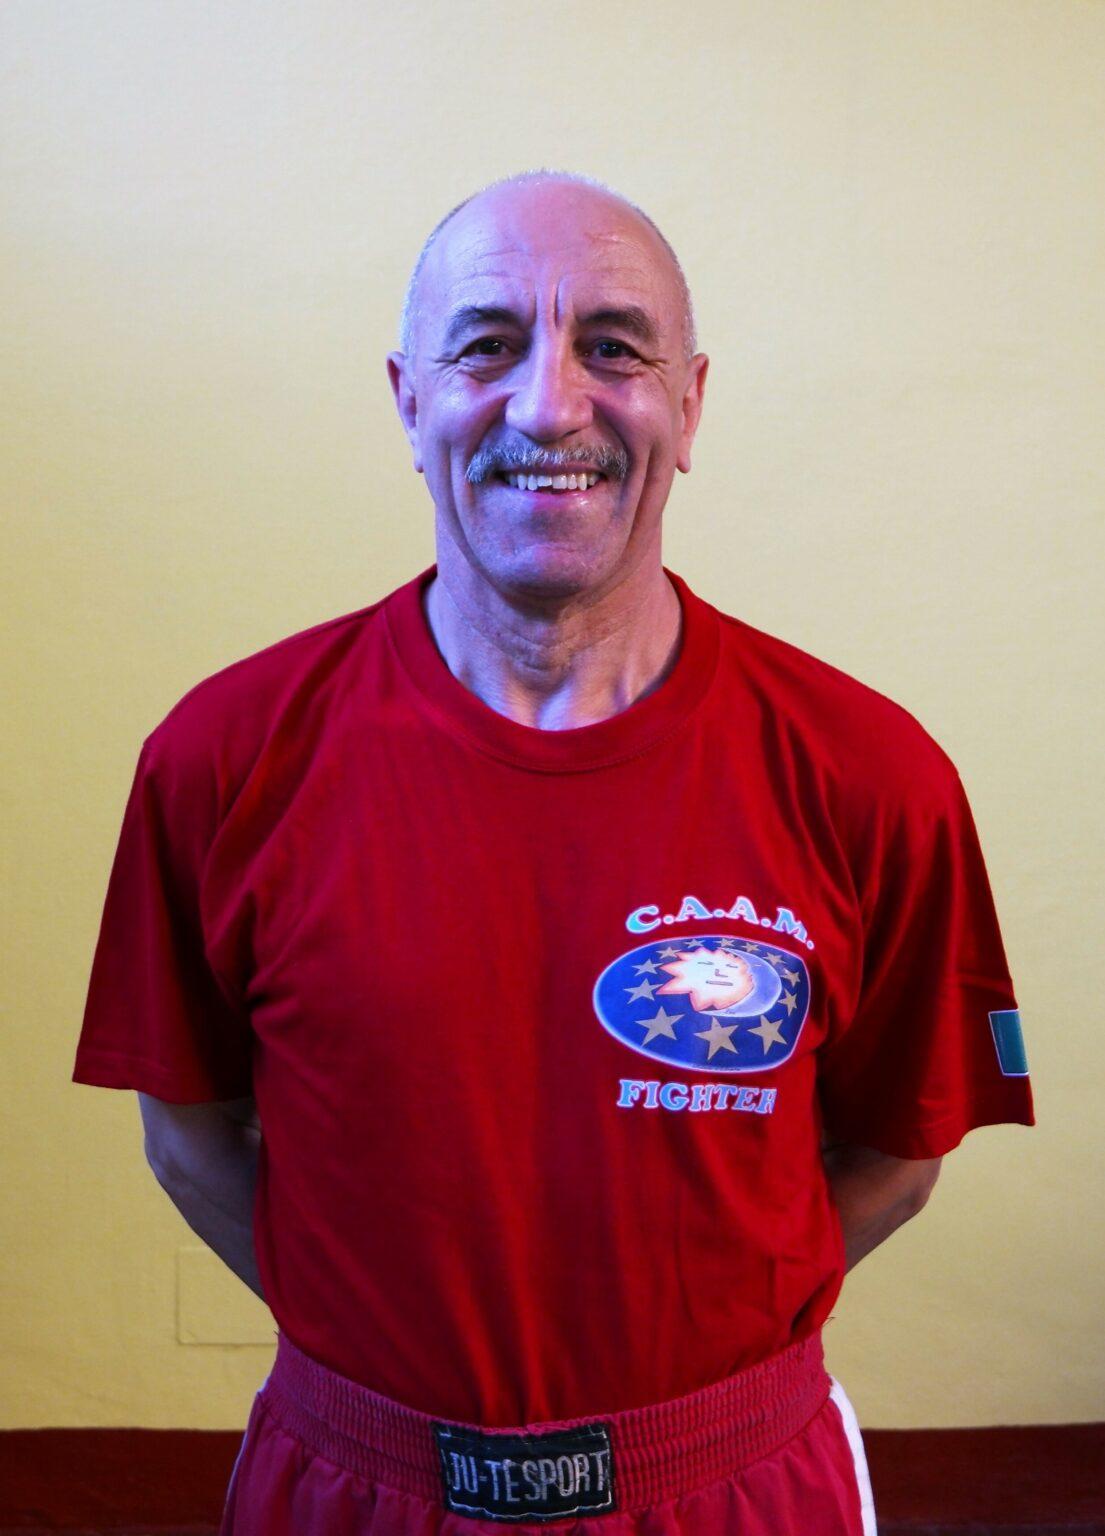 Maestro Terzulli Carmine Jeet Kune Do CAAM Fighters